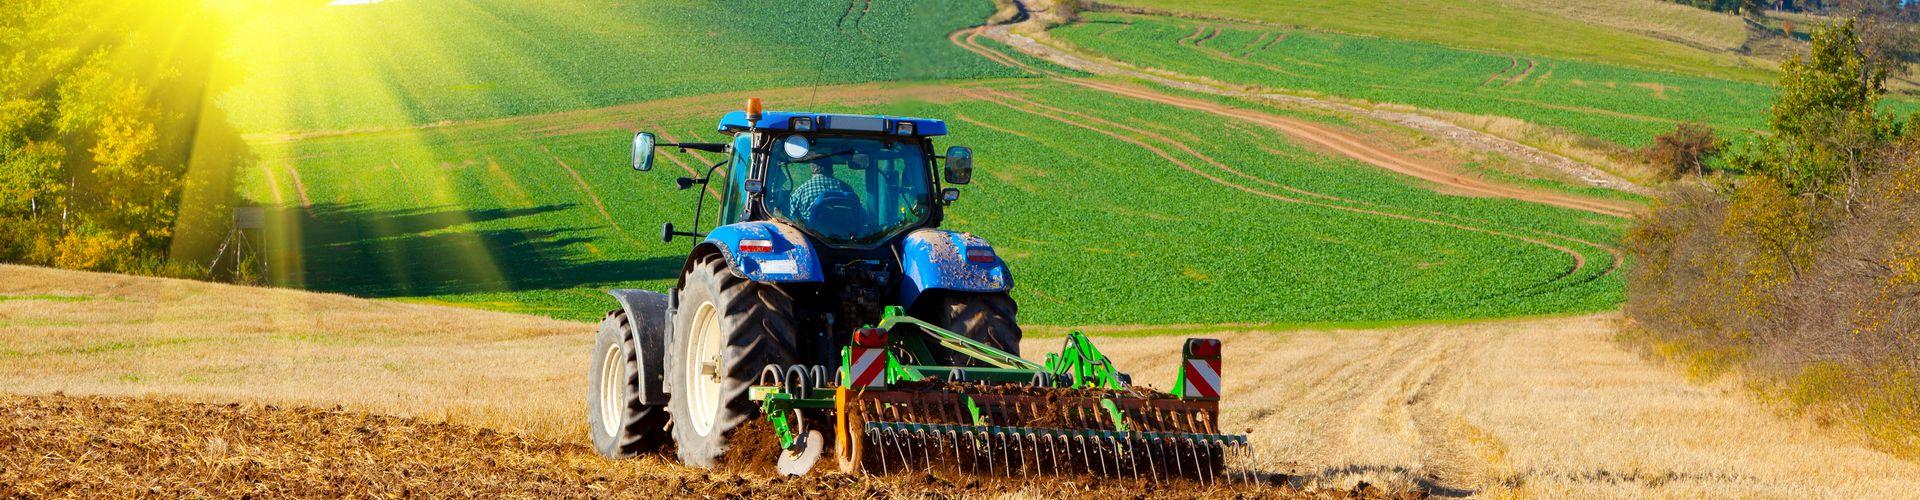 slider-2-traktor-servis